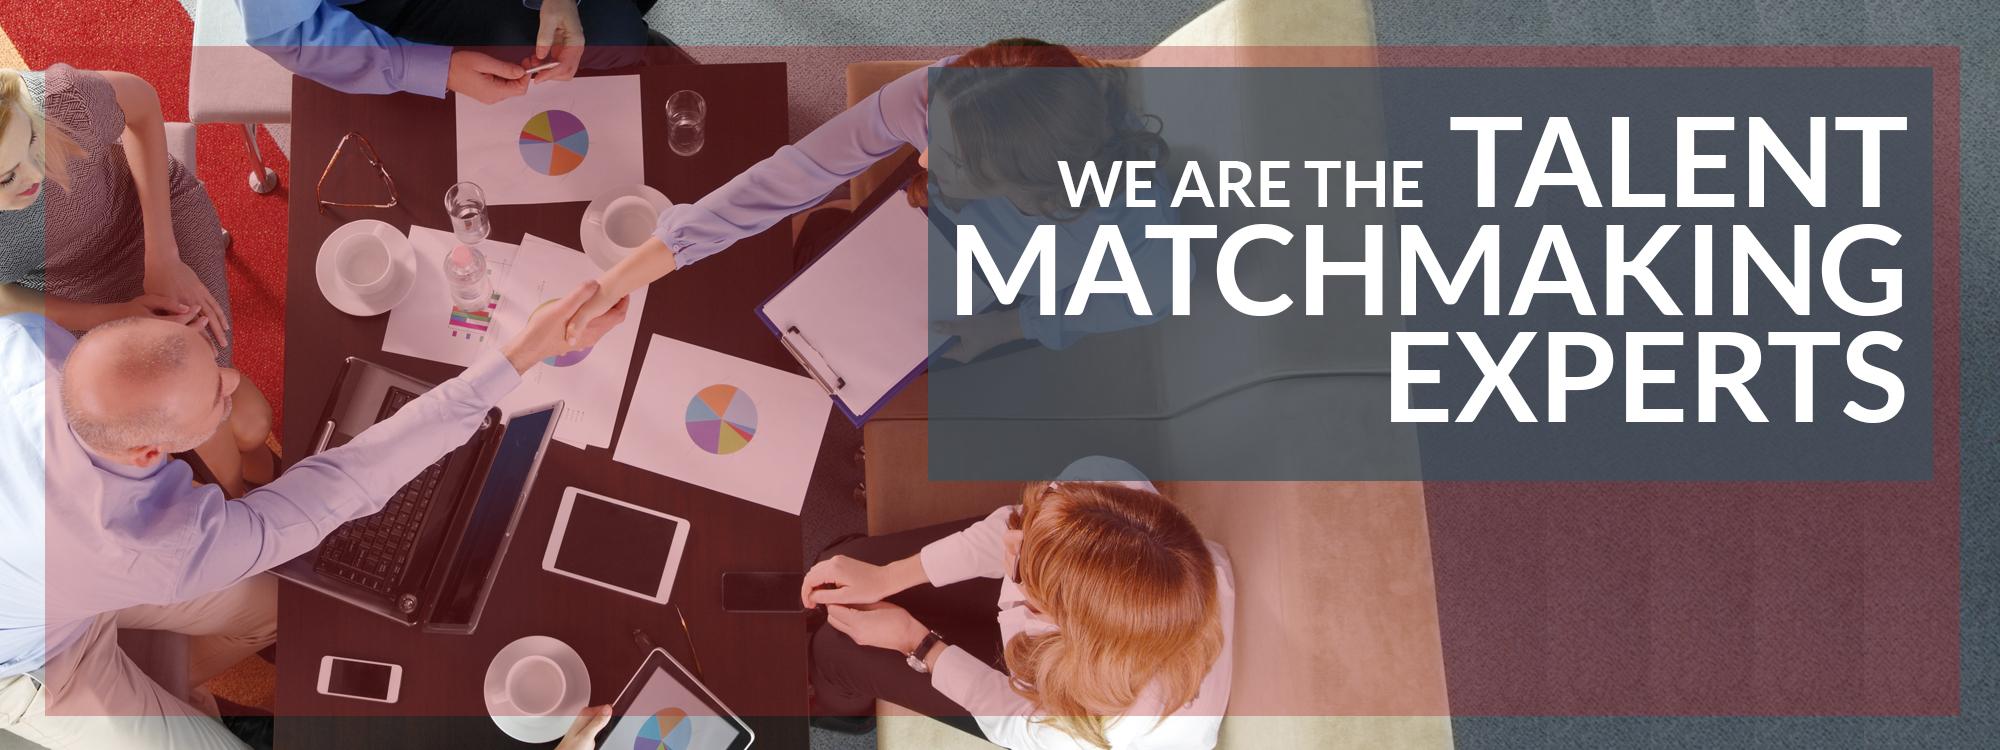 MatchmakingLATO